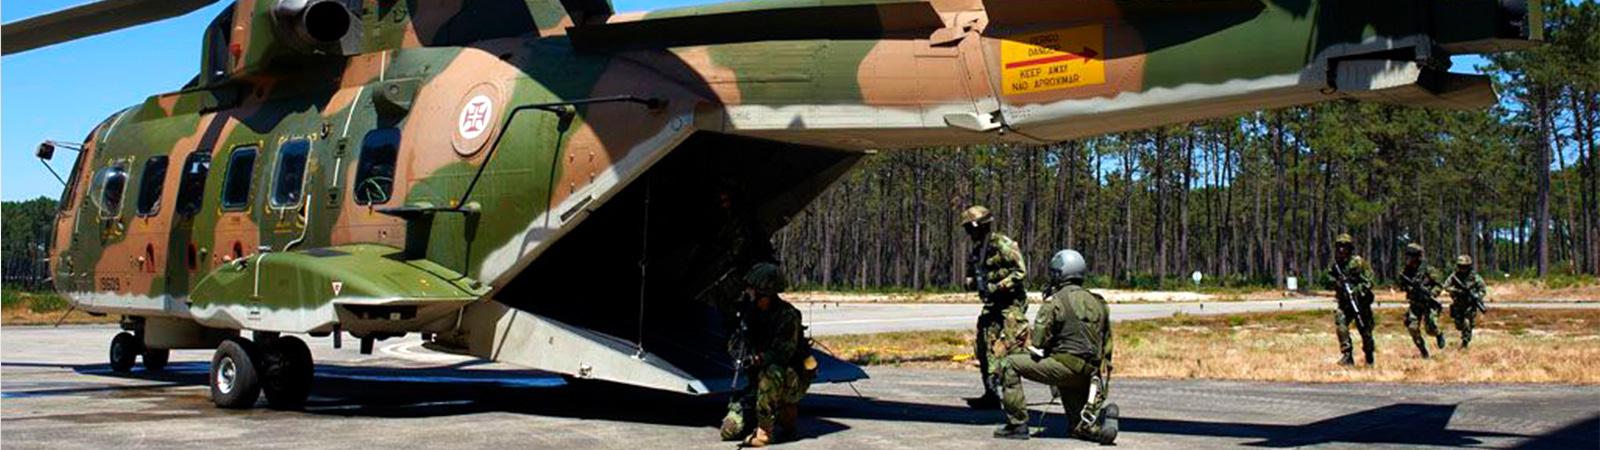 EU announces Action Plan on Military Mobility